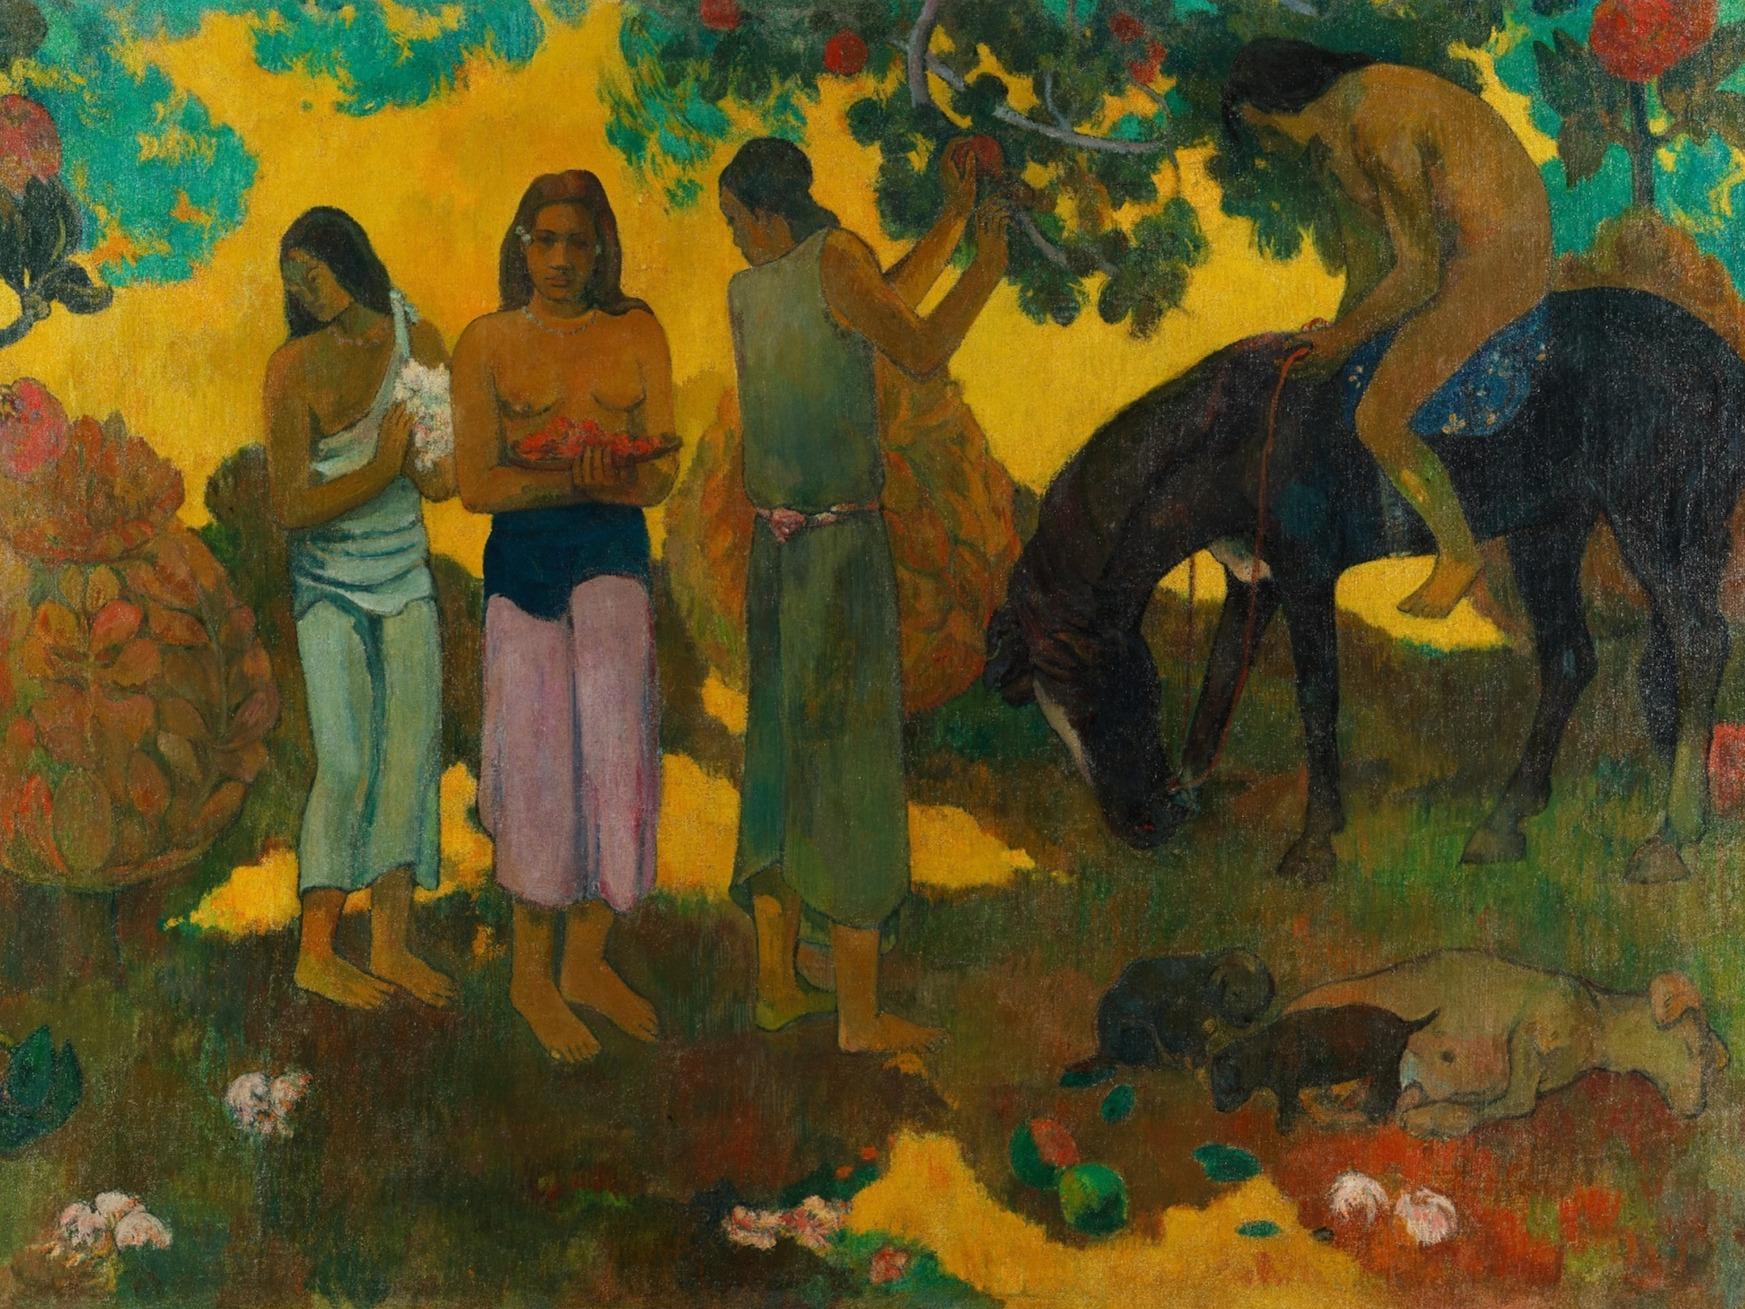 Rupe Rupe (Сбор плодов) [ пейзаж ] - Гоген Поль ( Paul Gauguin ) фото